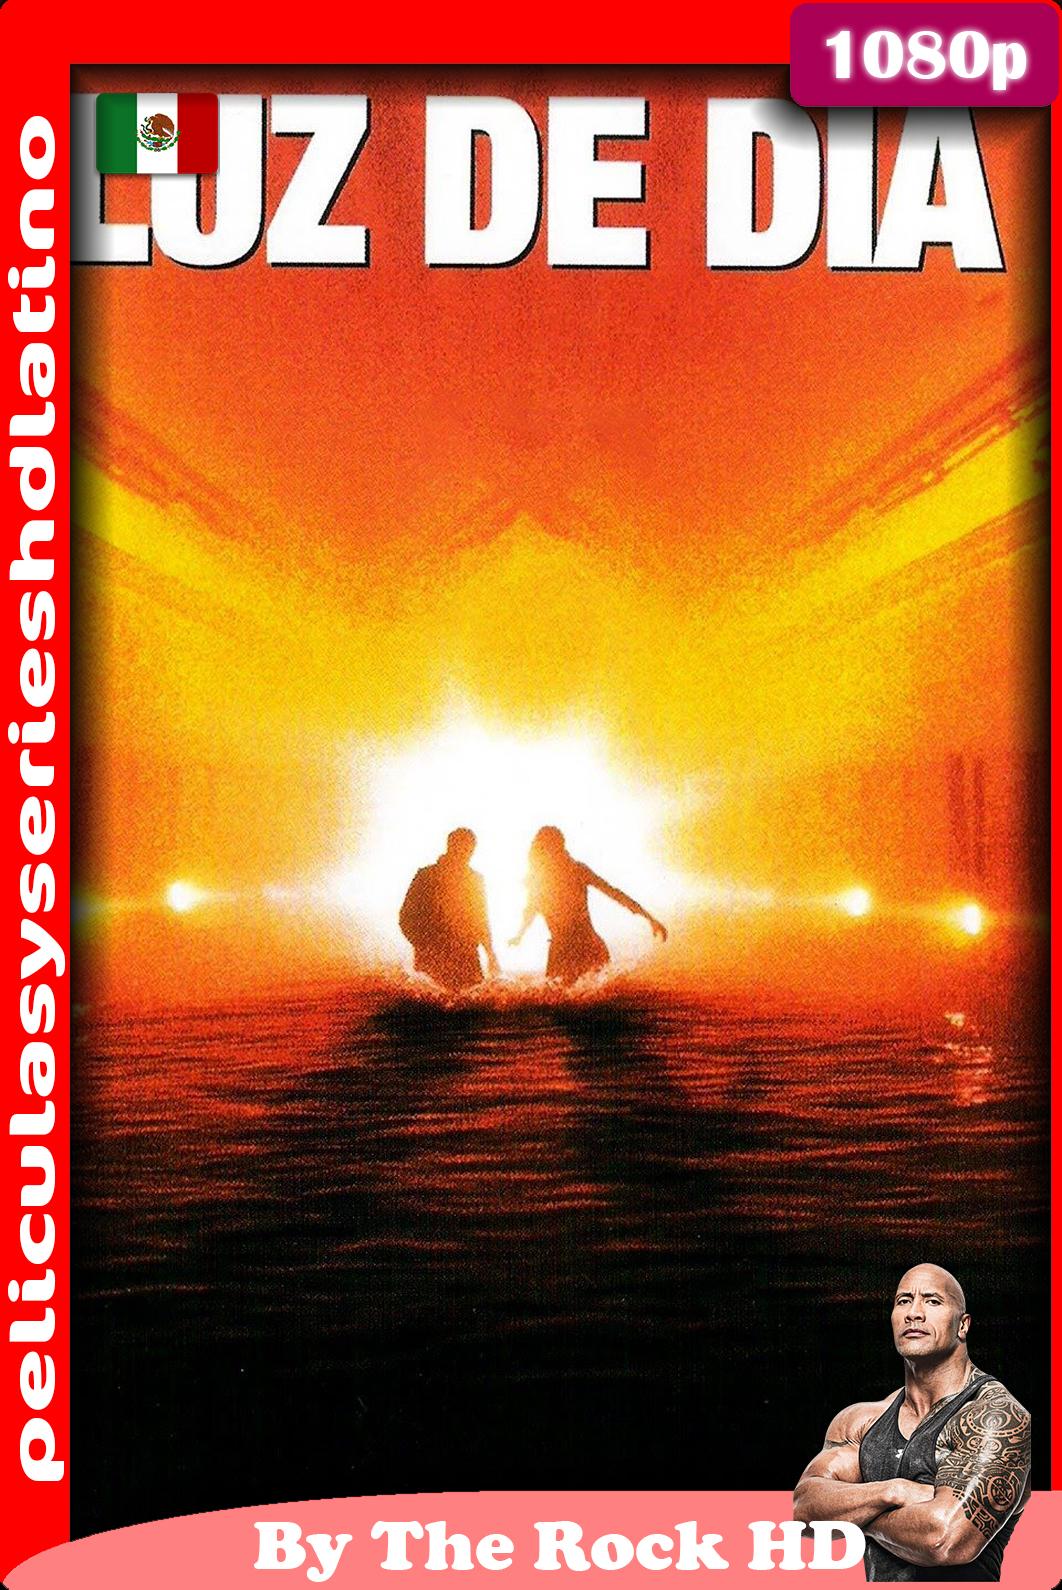 Daylight (Pánico en el túnel), (1996) [1080p] [Latino] [Google Drive]